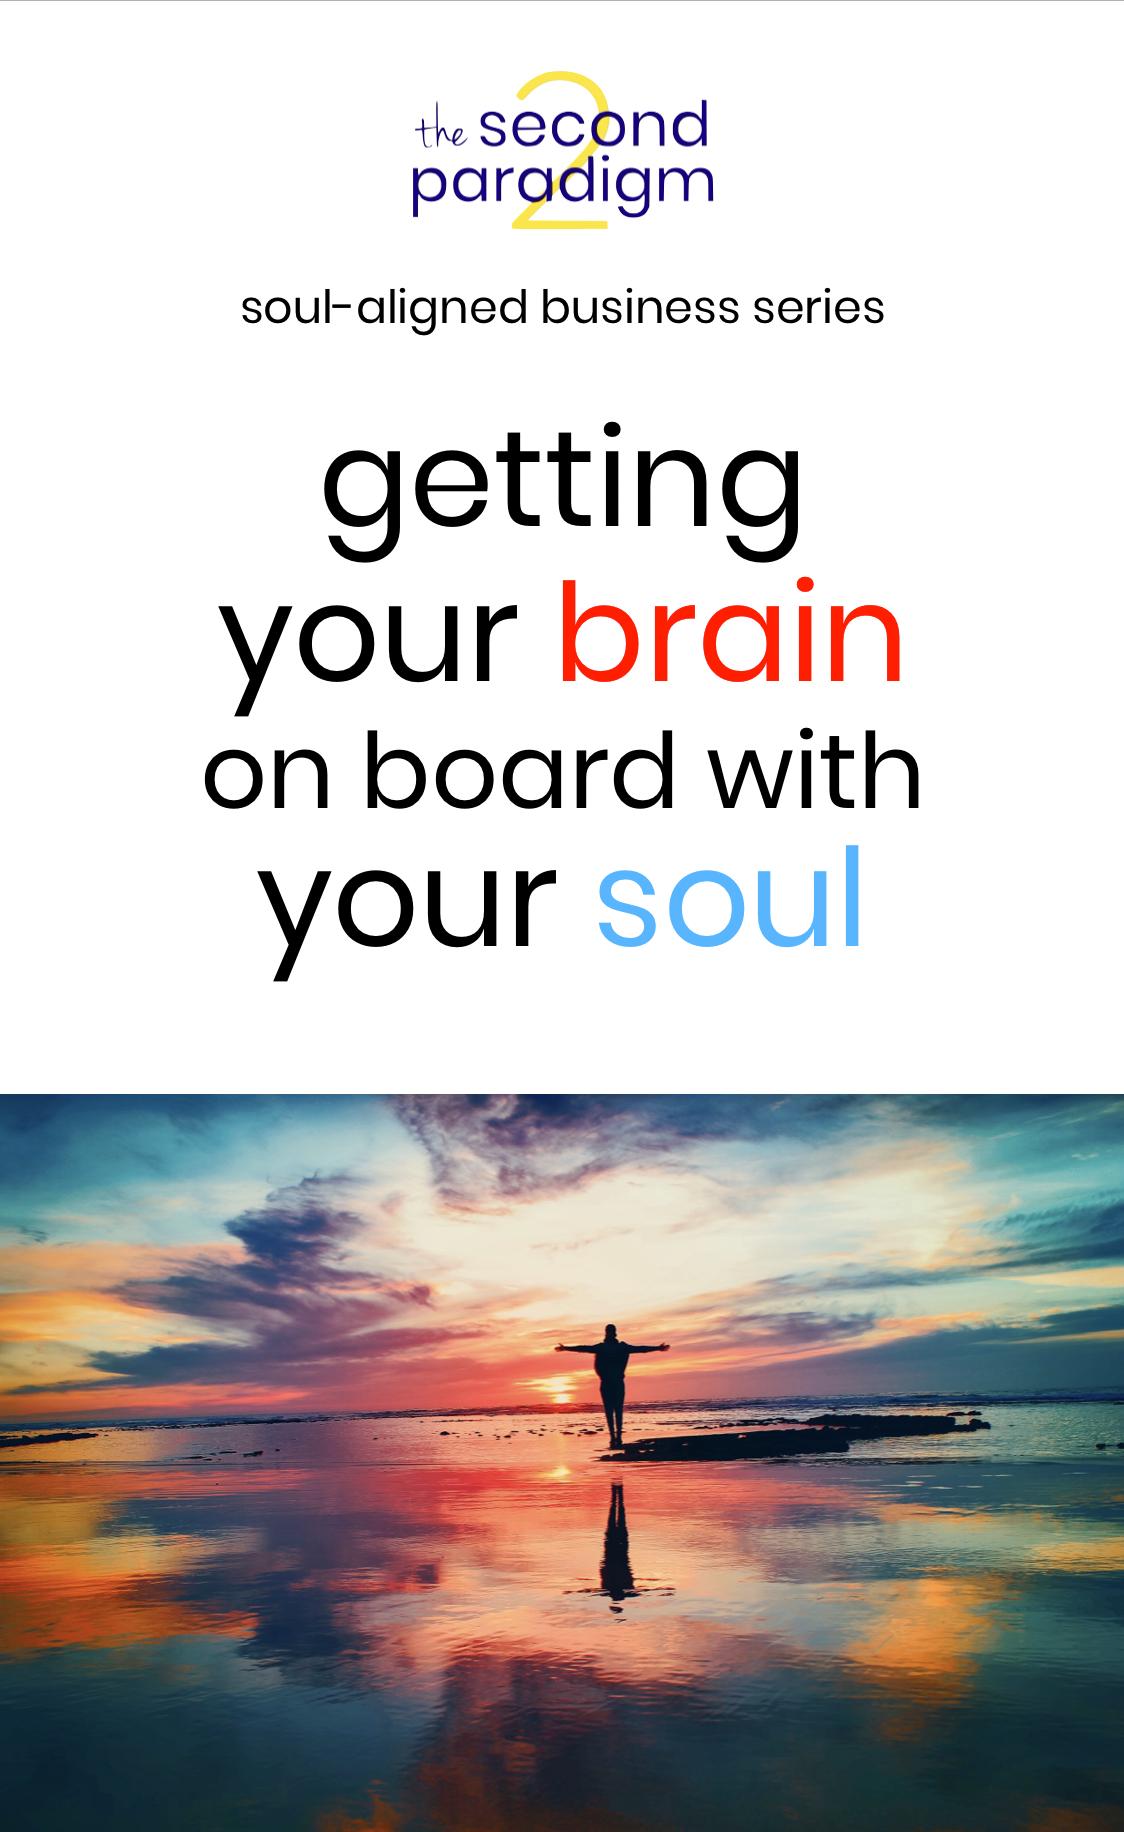 Getting Your Brain on Board